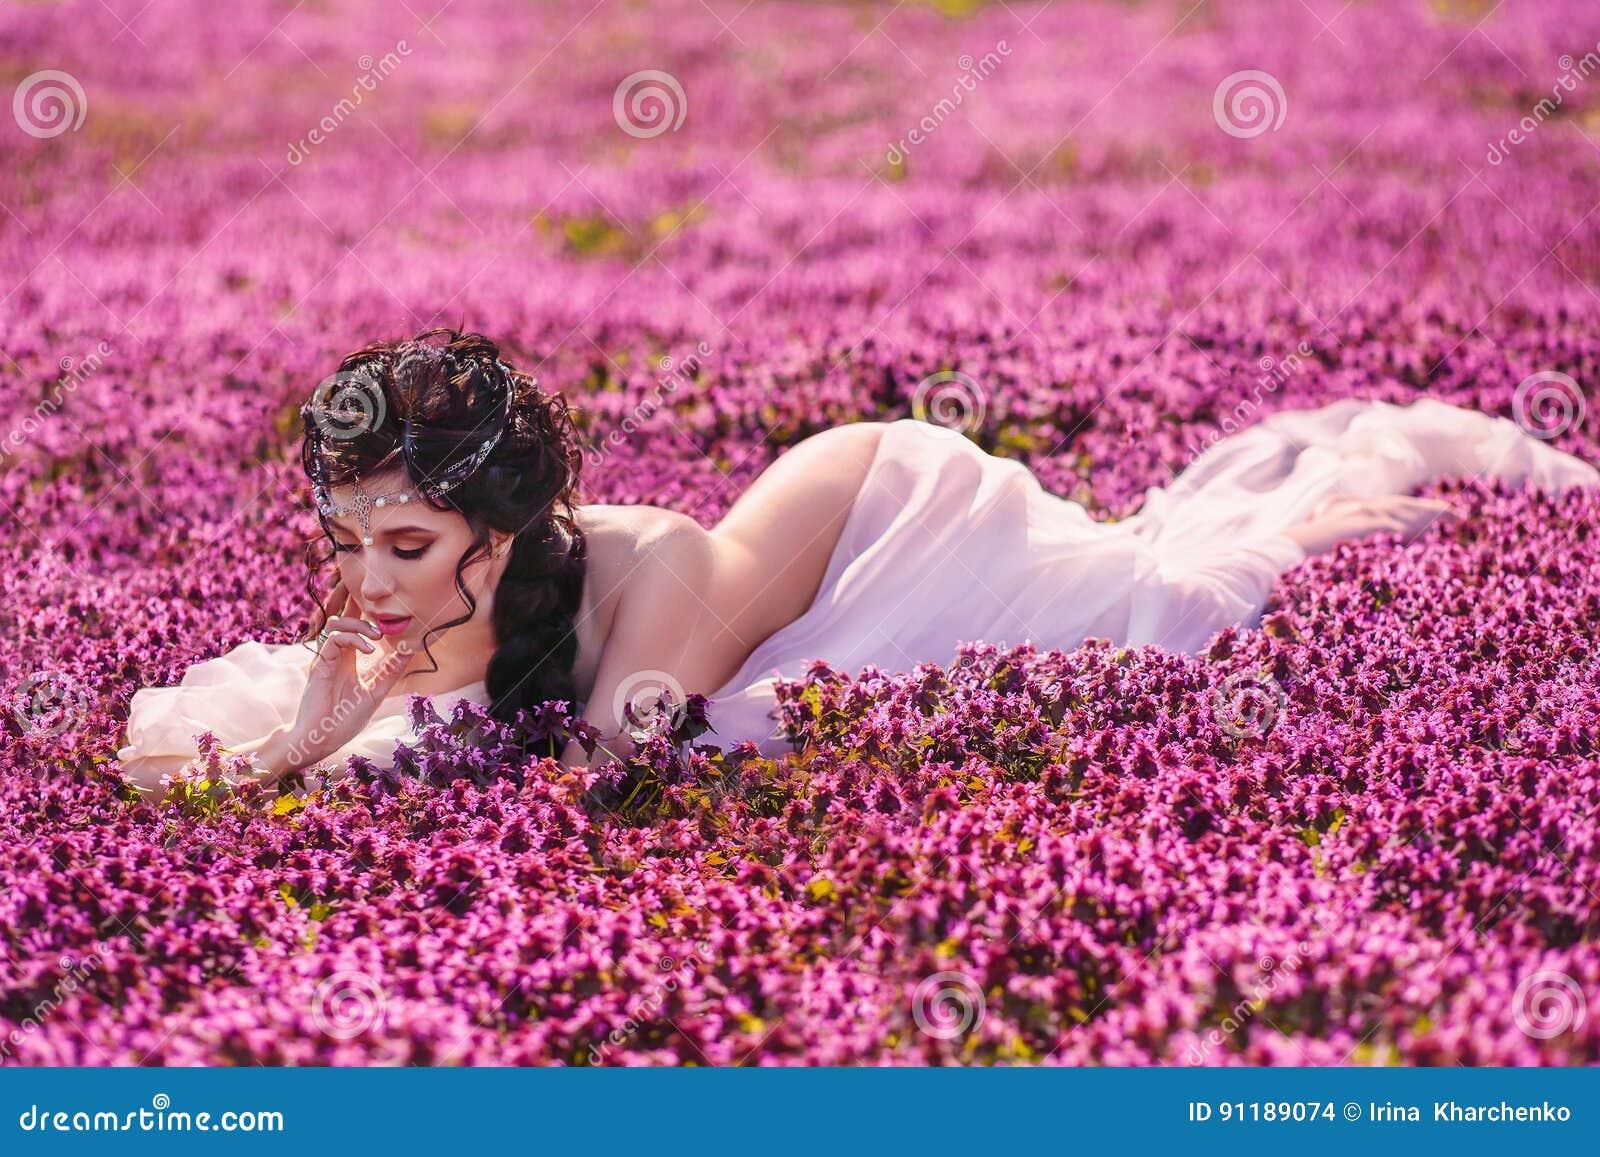 A Beautiful Girl Stock Photo Image Of Fairy Dress Model 91189074